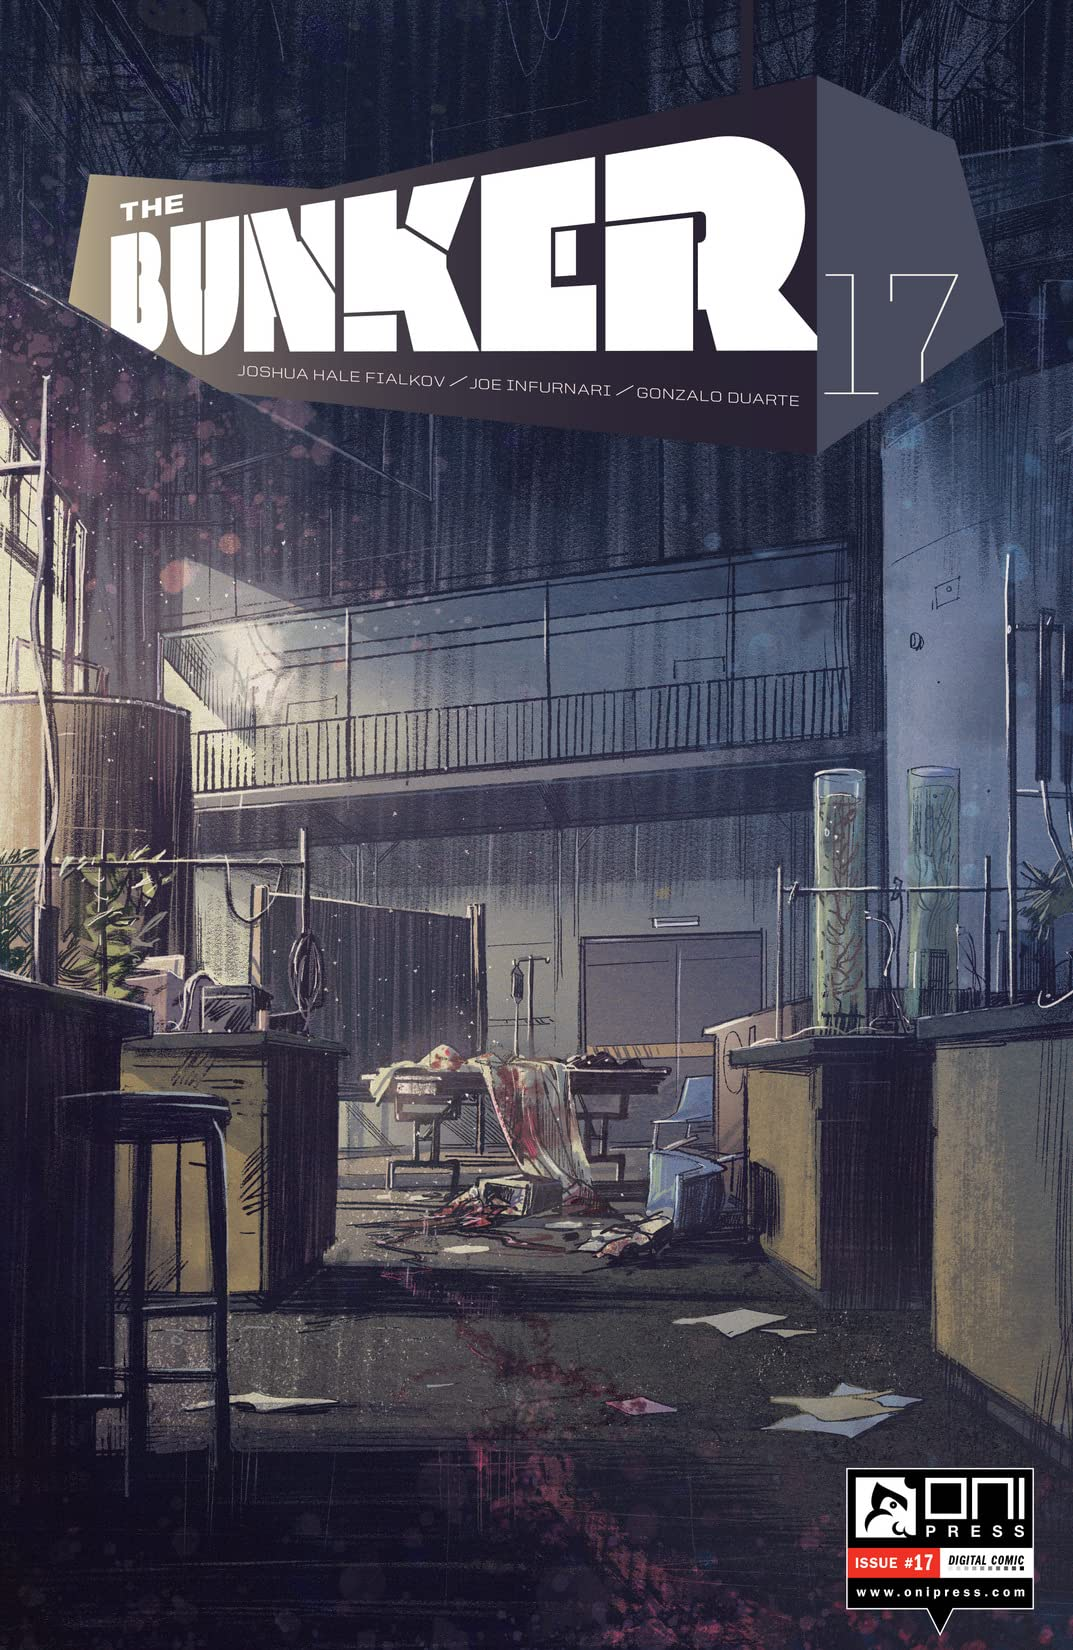 The Bunker #17